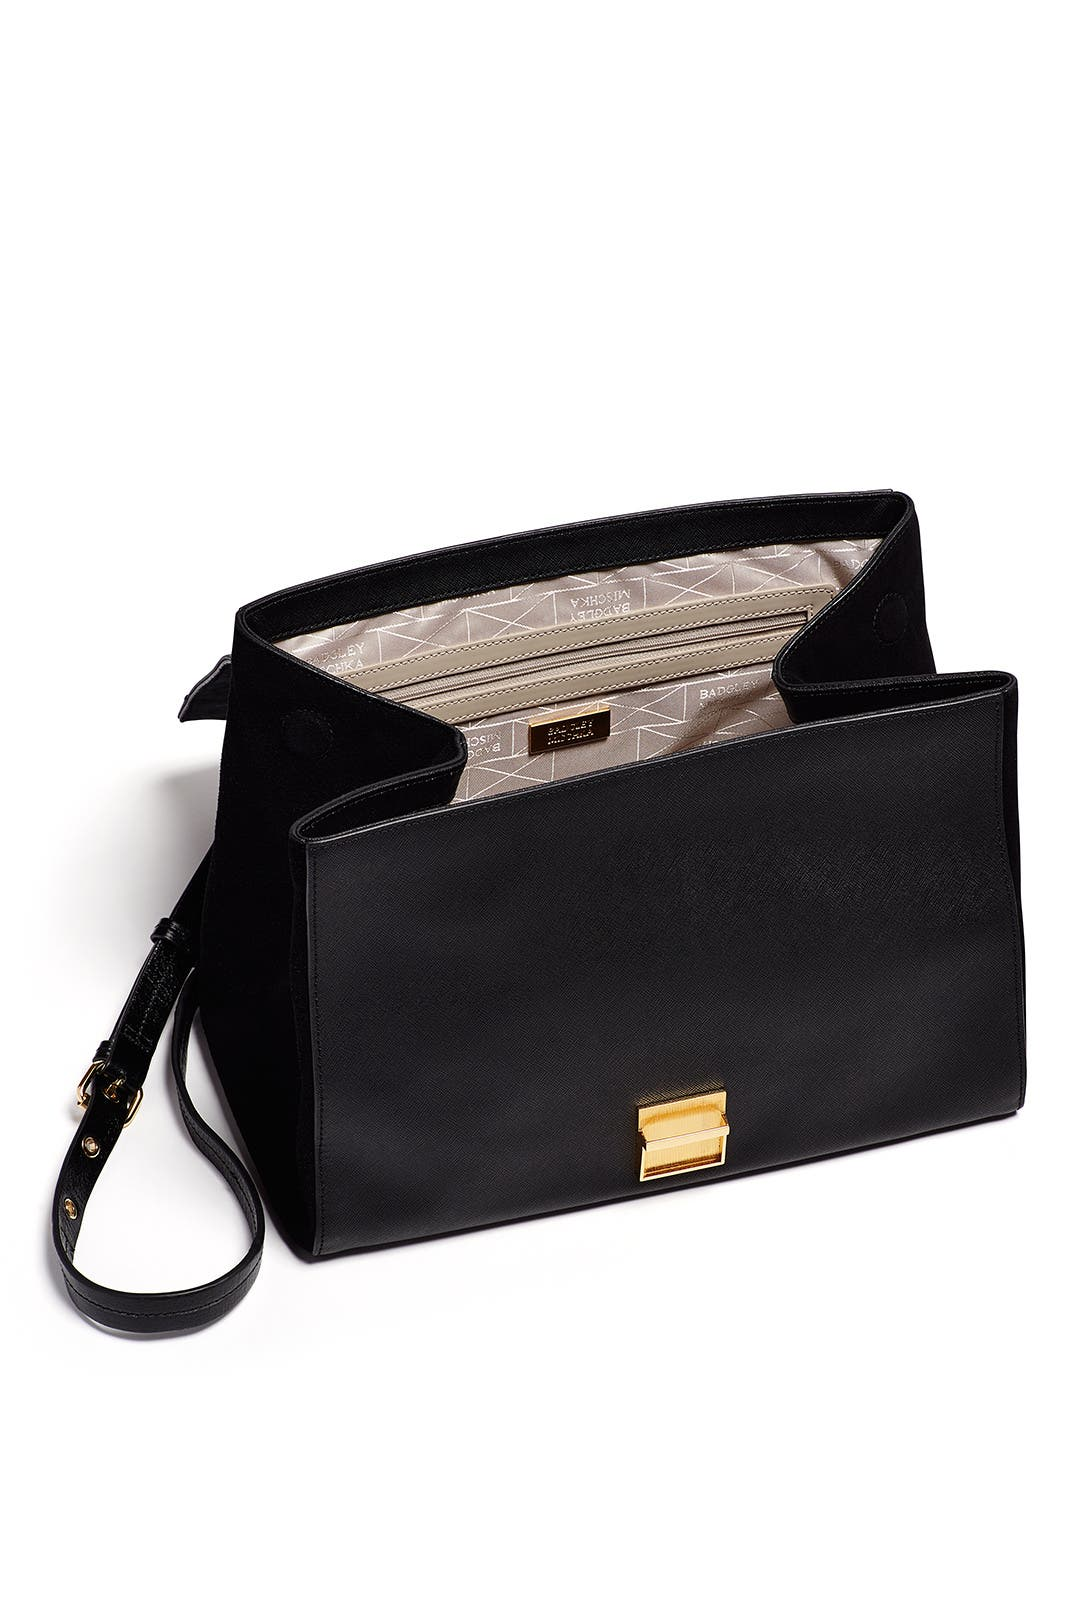 Black Mindy Handbag By Badgley Mischka Handbags For 75 Rent The Runway